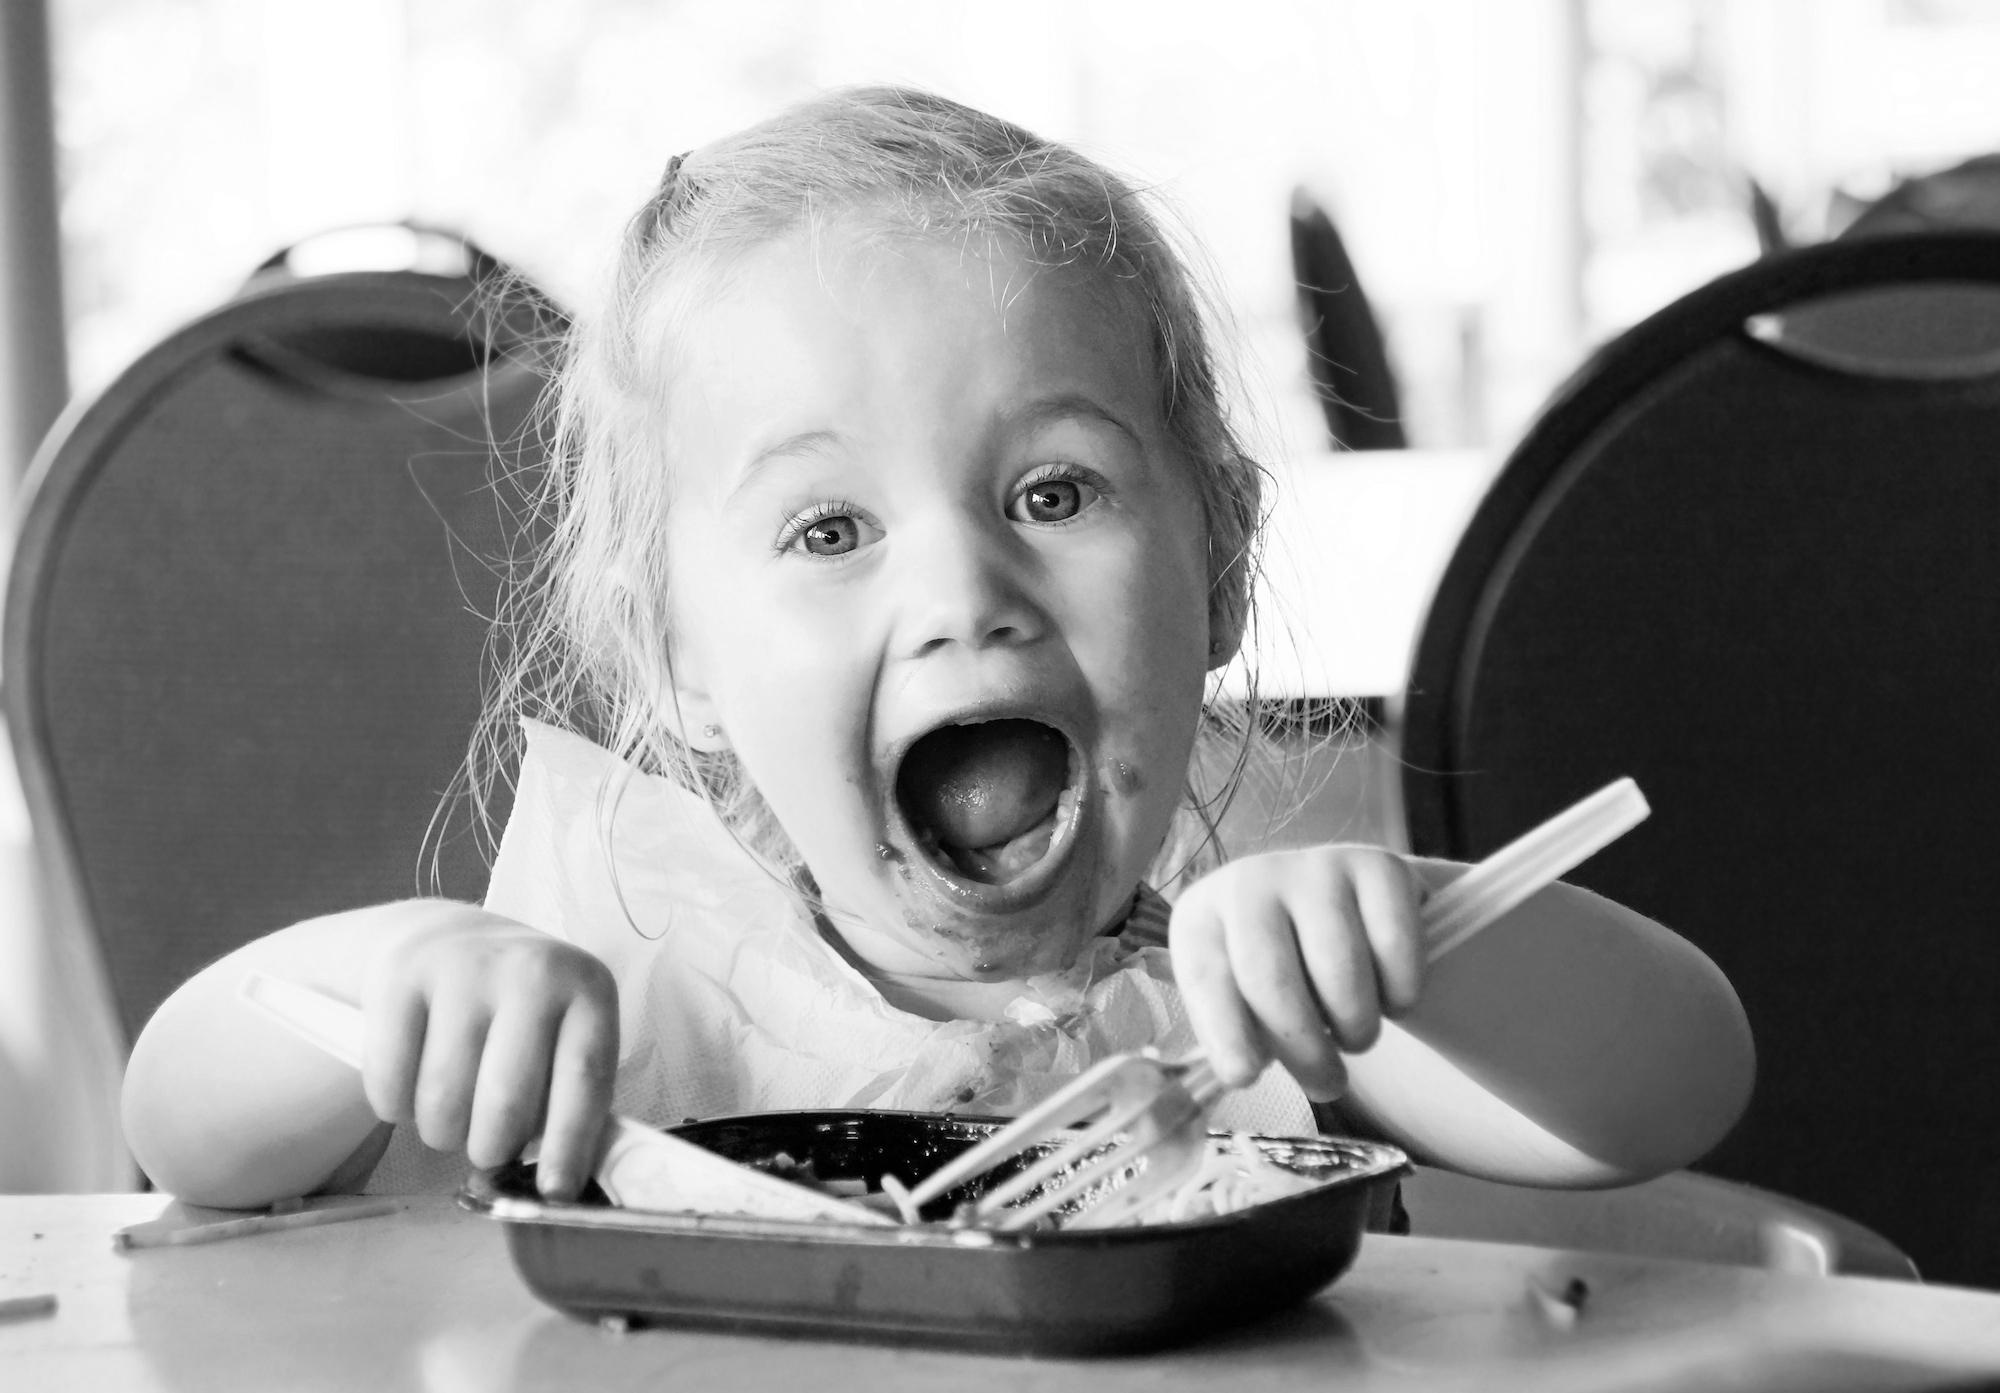 baby eating spaghetti play dough